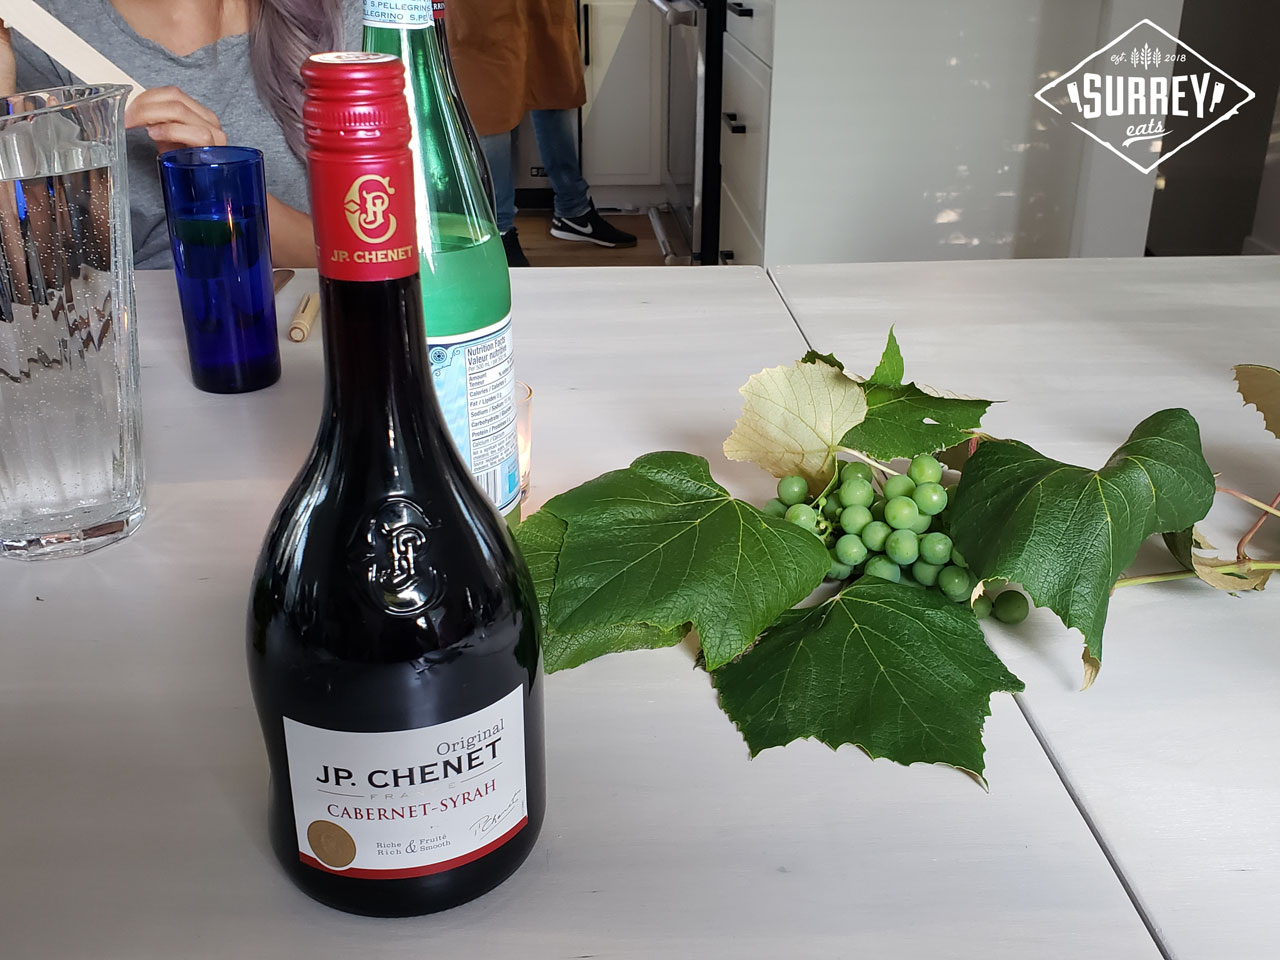 A bottle of JP Chenet Cabernet Syrah